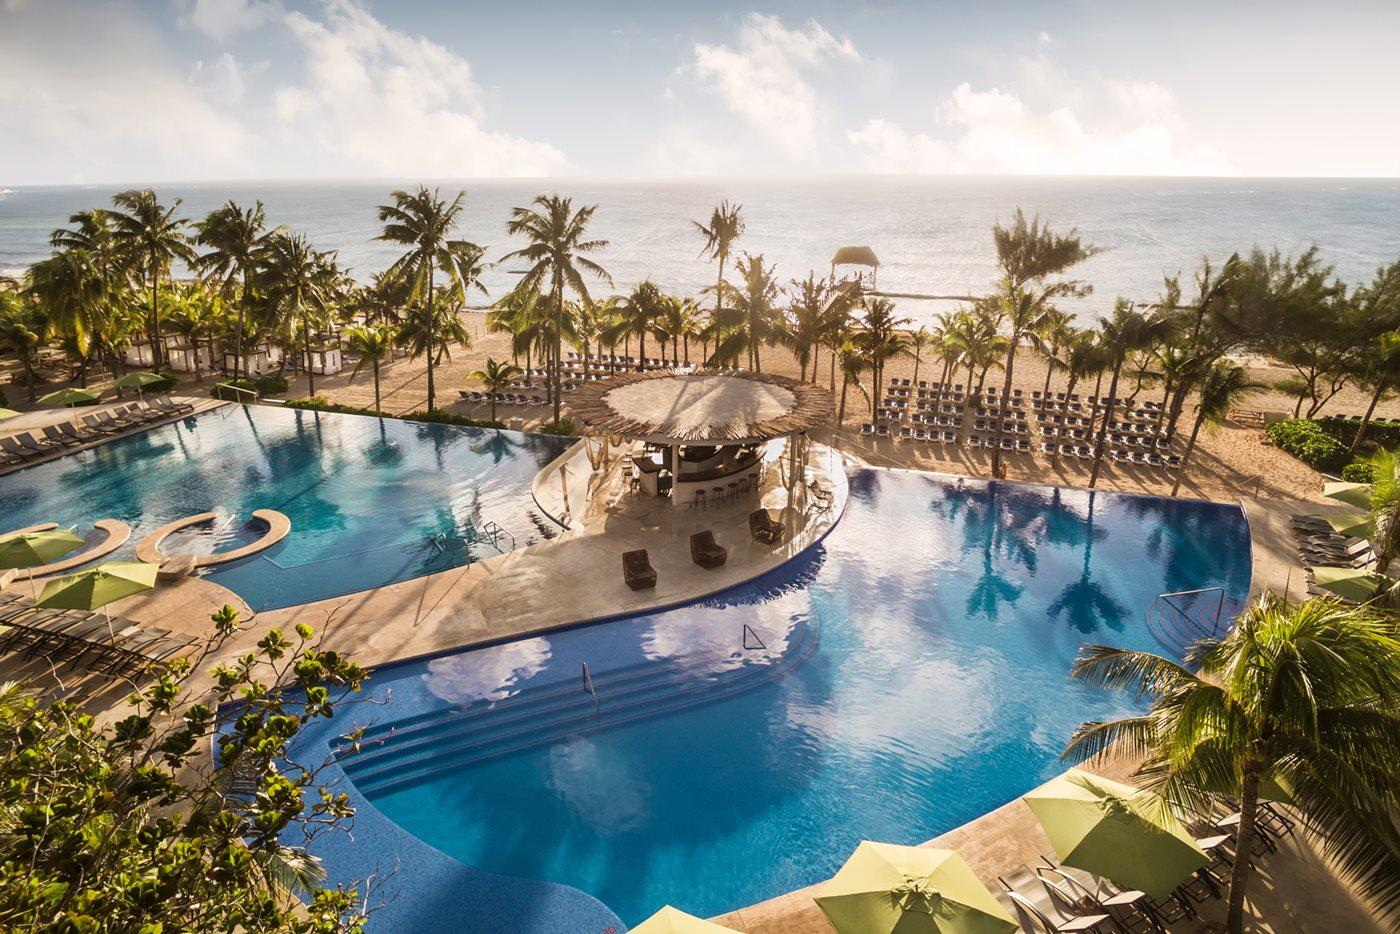 RIV-Fives-Azul-Beach-Hotel-Residence-Del-Carmen-Aerial-002